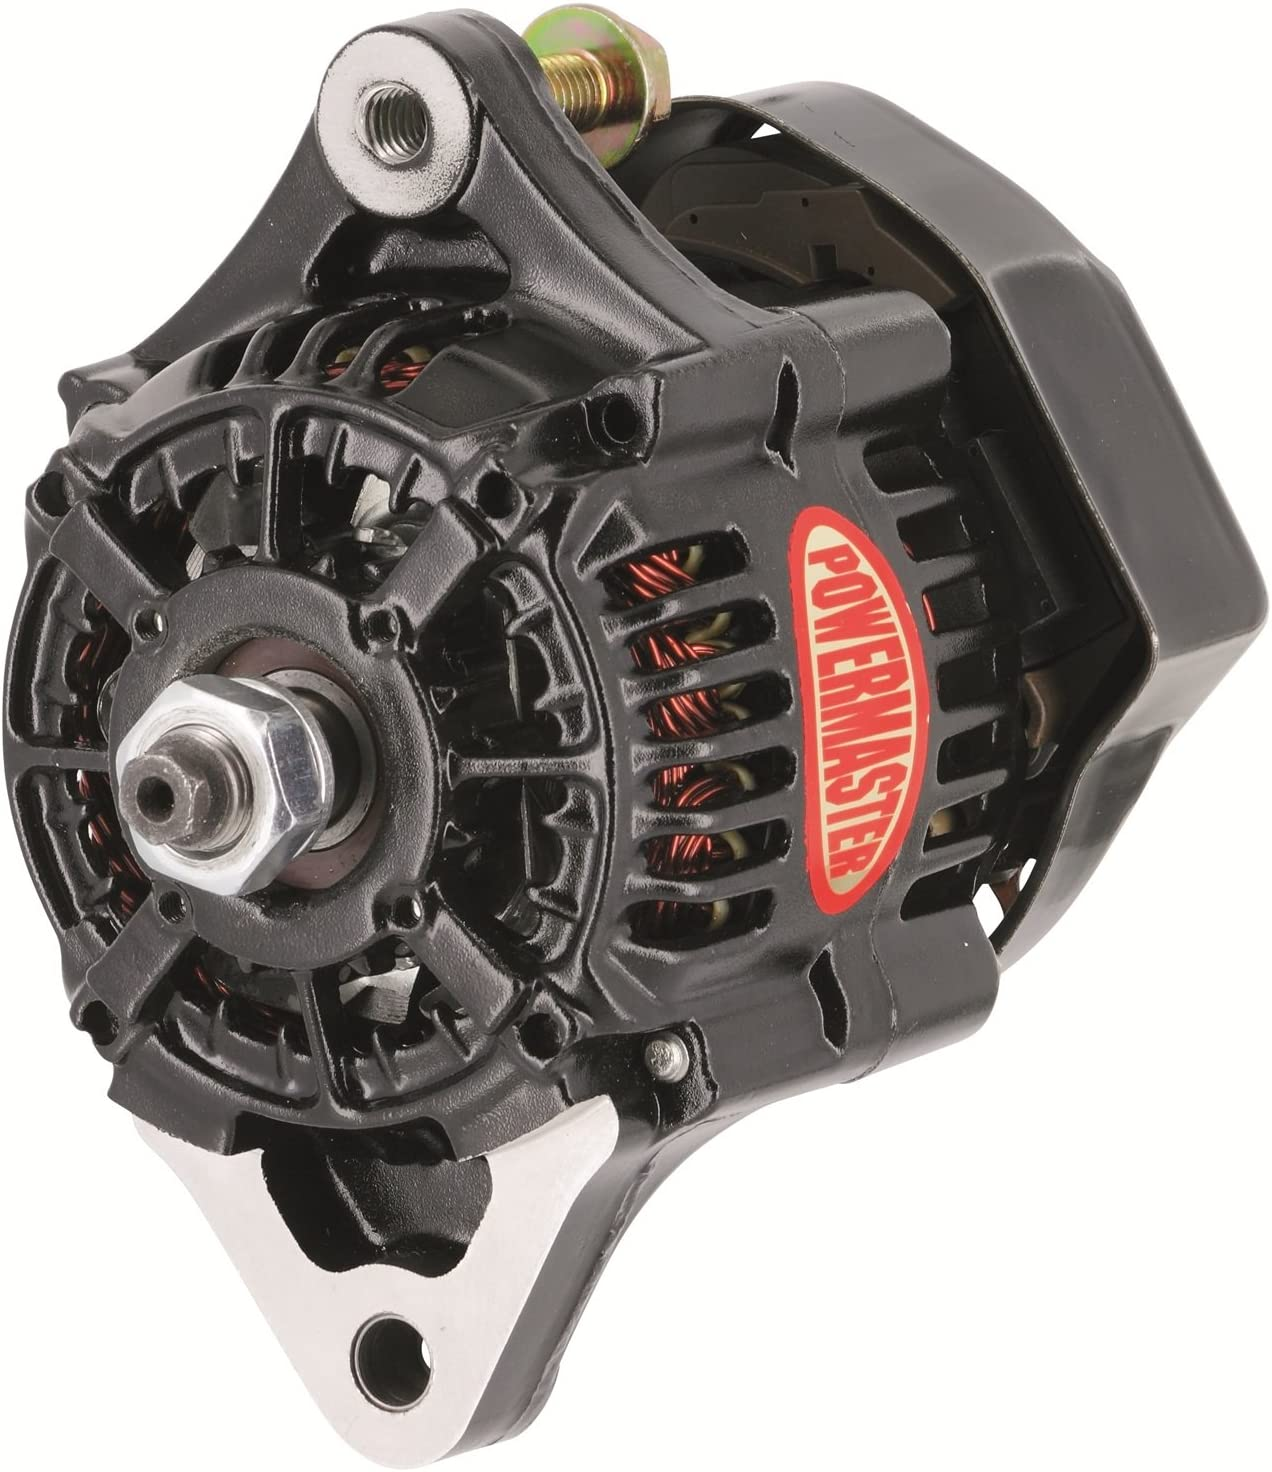 Powermaster 8182 Alt Denso Race 93mm Black 75A 12 Volt 1-Wire 714NvzsflzLSL1500_